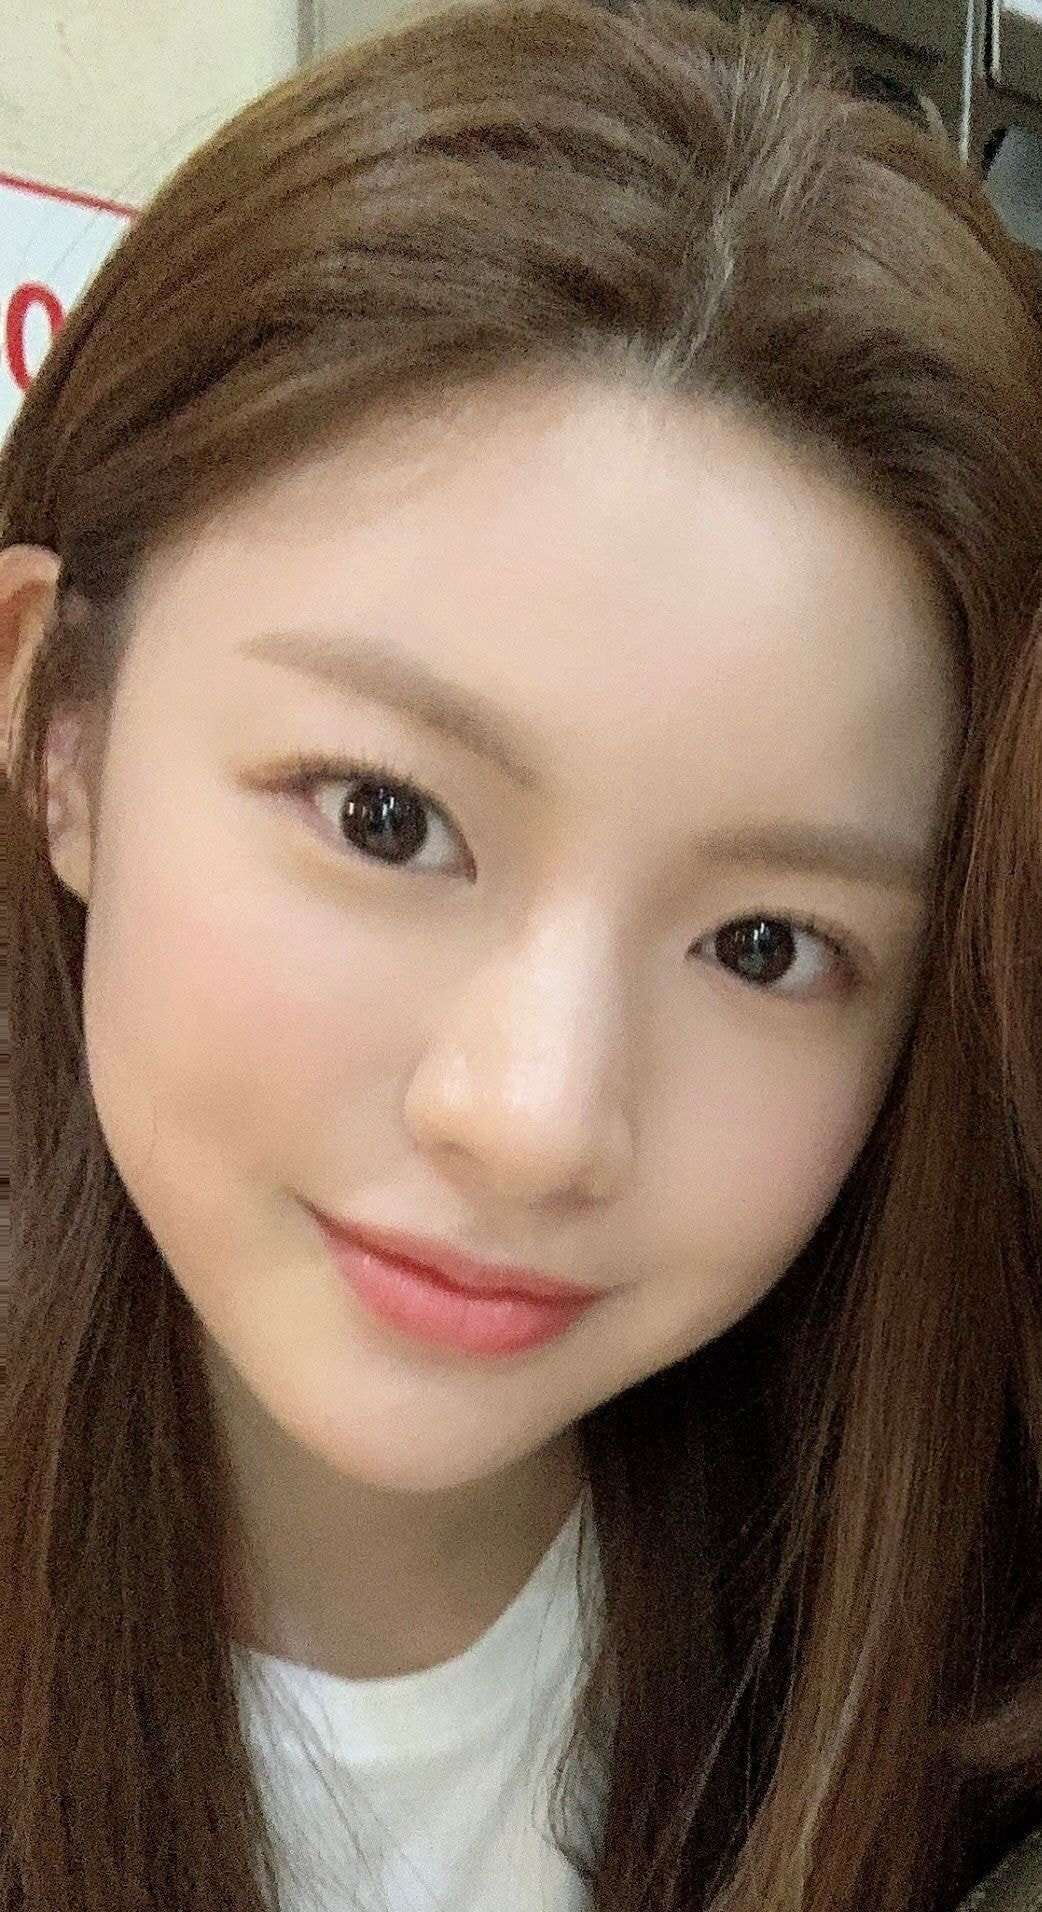 44.jpeg 최근 신인 여배우들중 가장 정석미녀 스타일 같은 배우.jpg